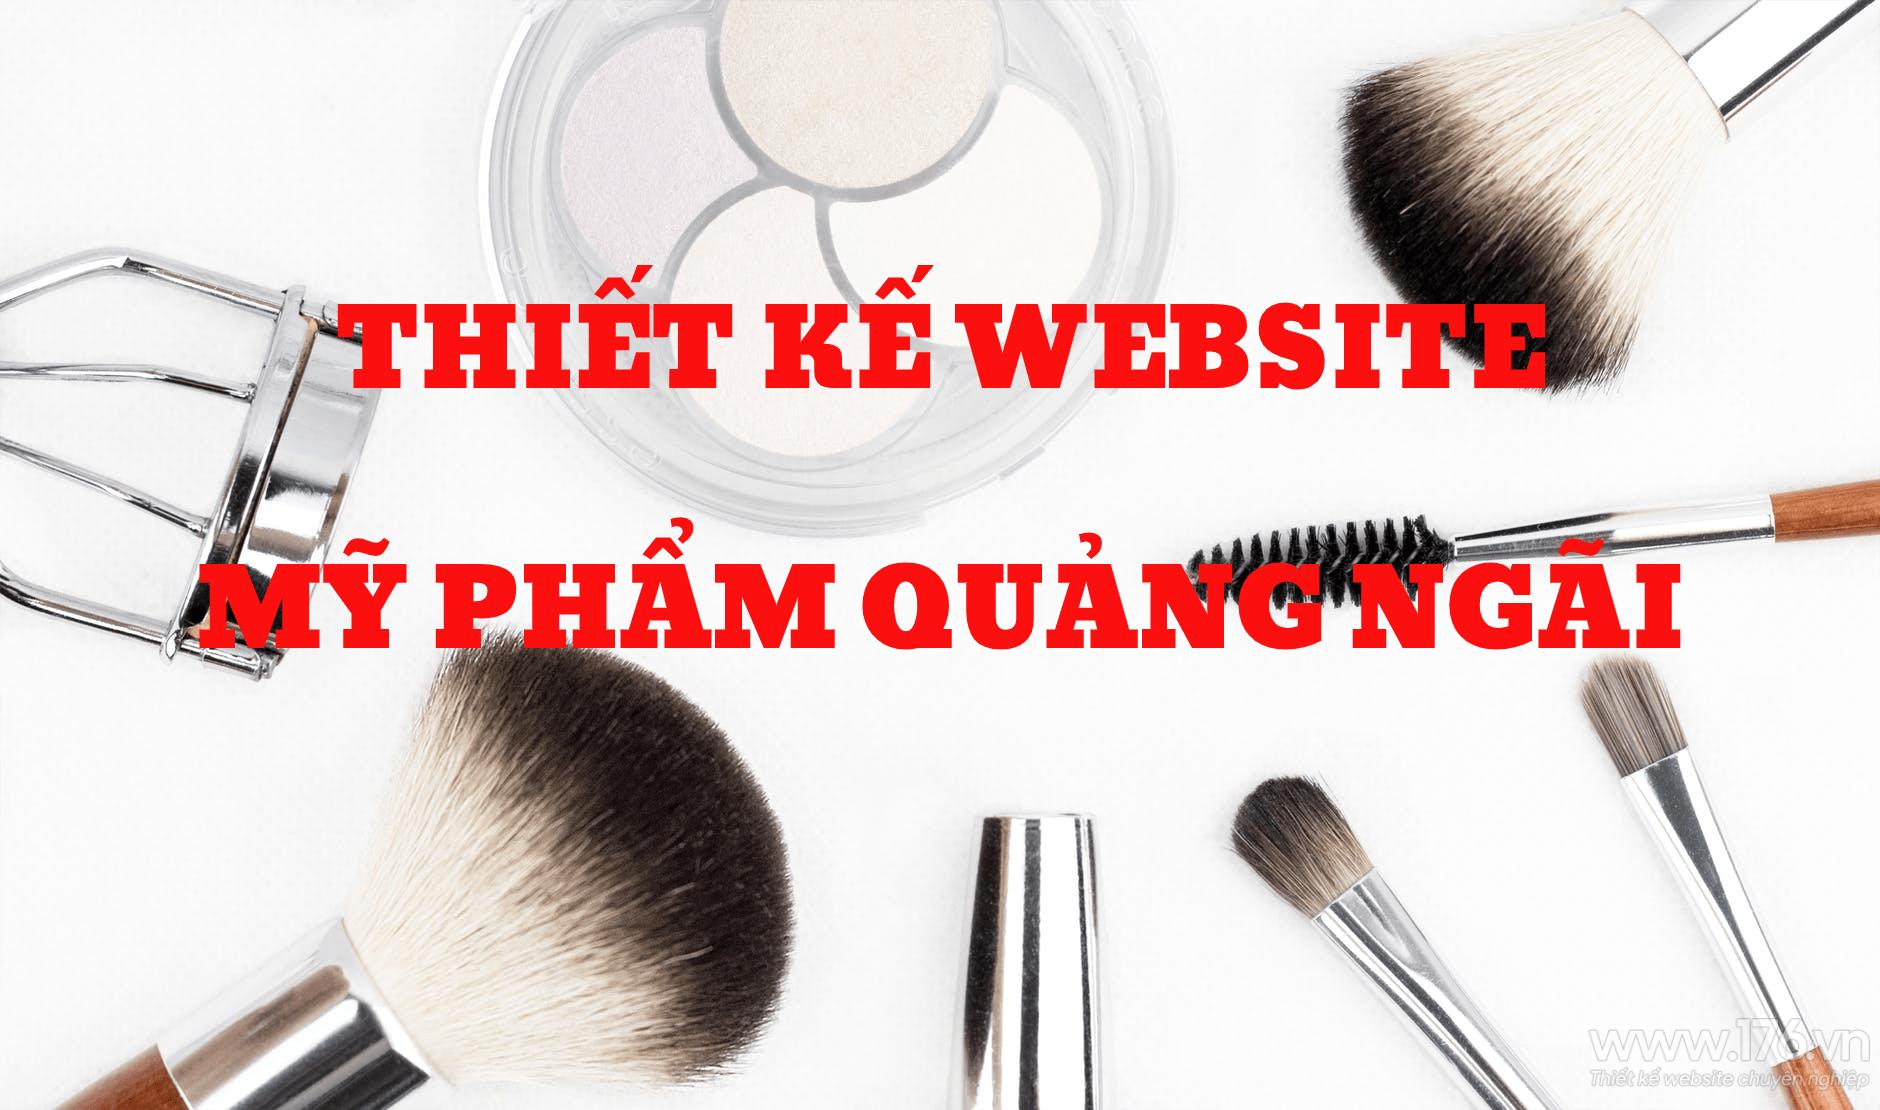 Thiet ke website my pham Quang Ngai 3